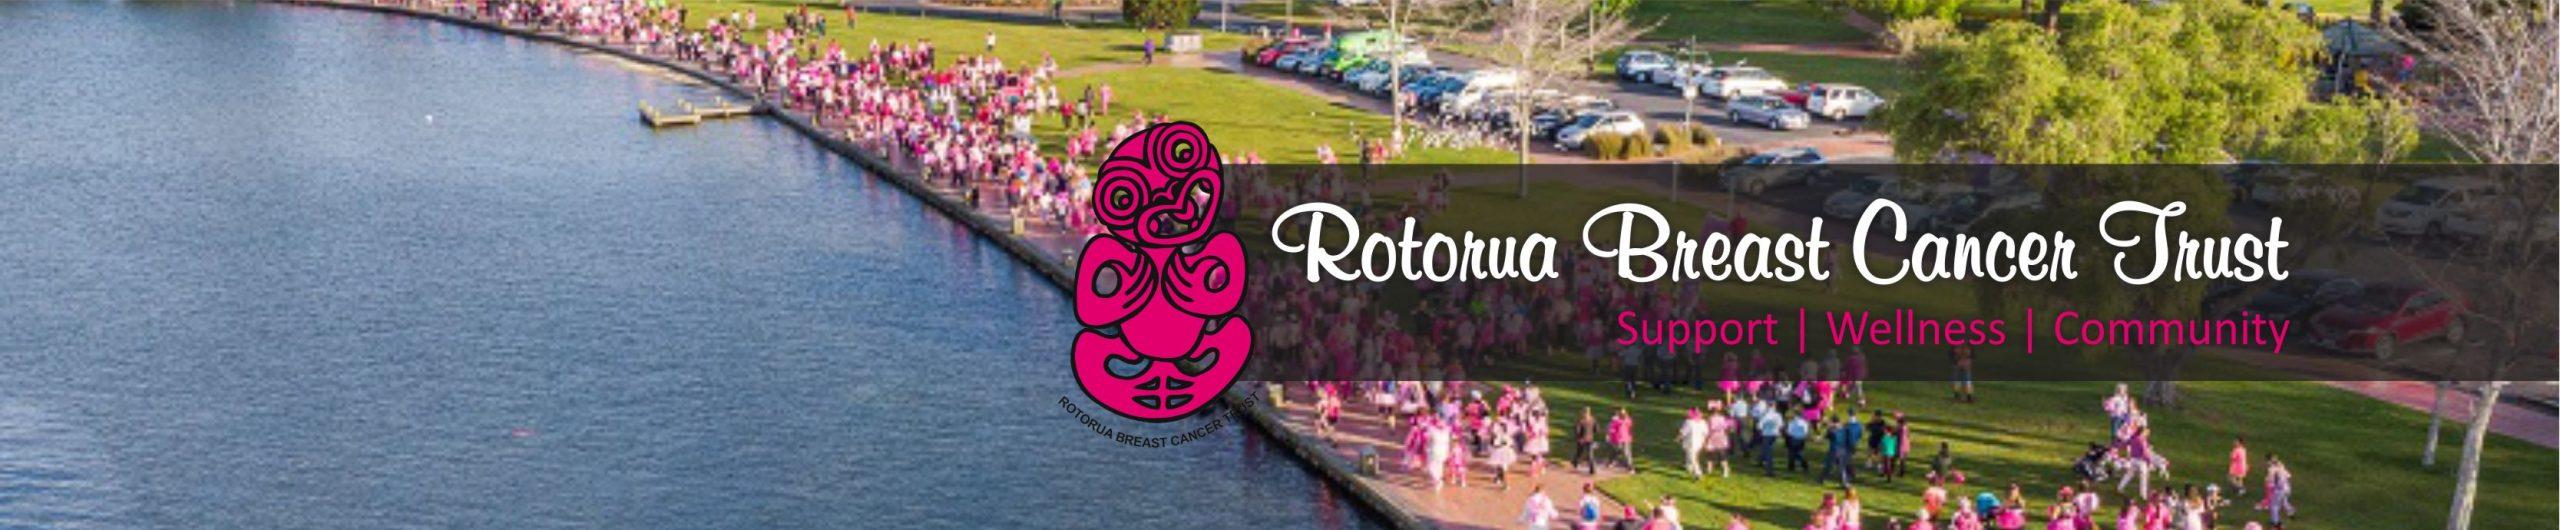 Rotorua Breast Cancer Trust